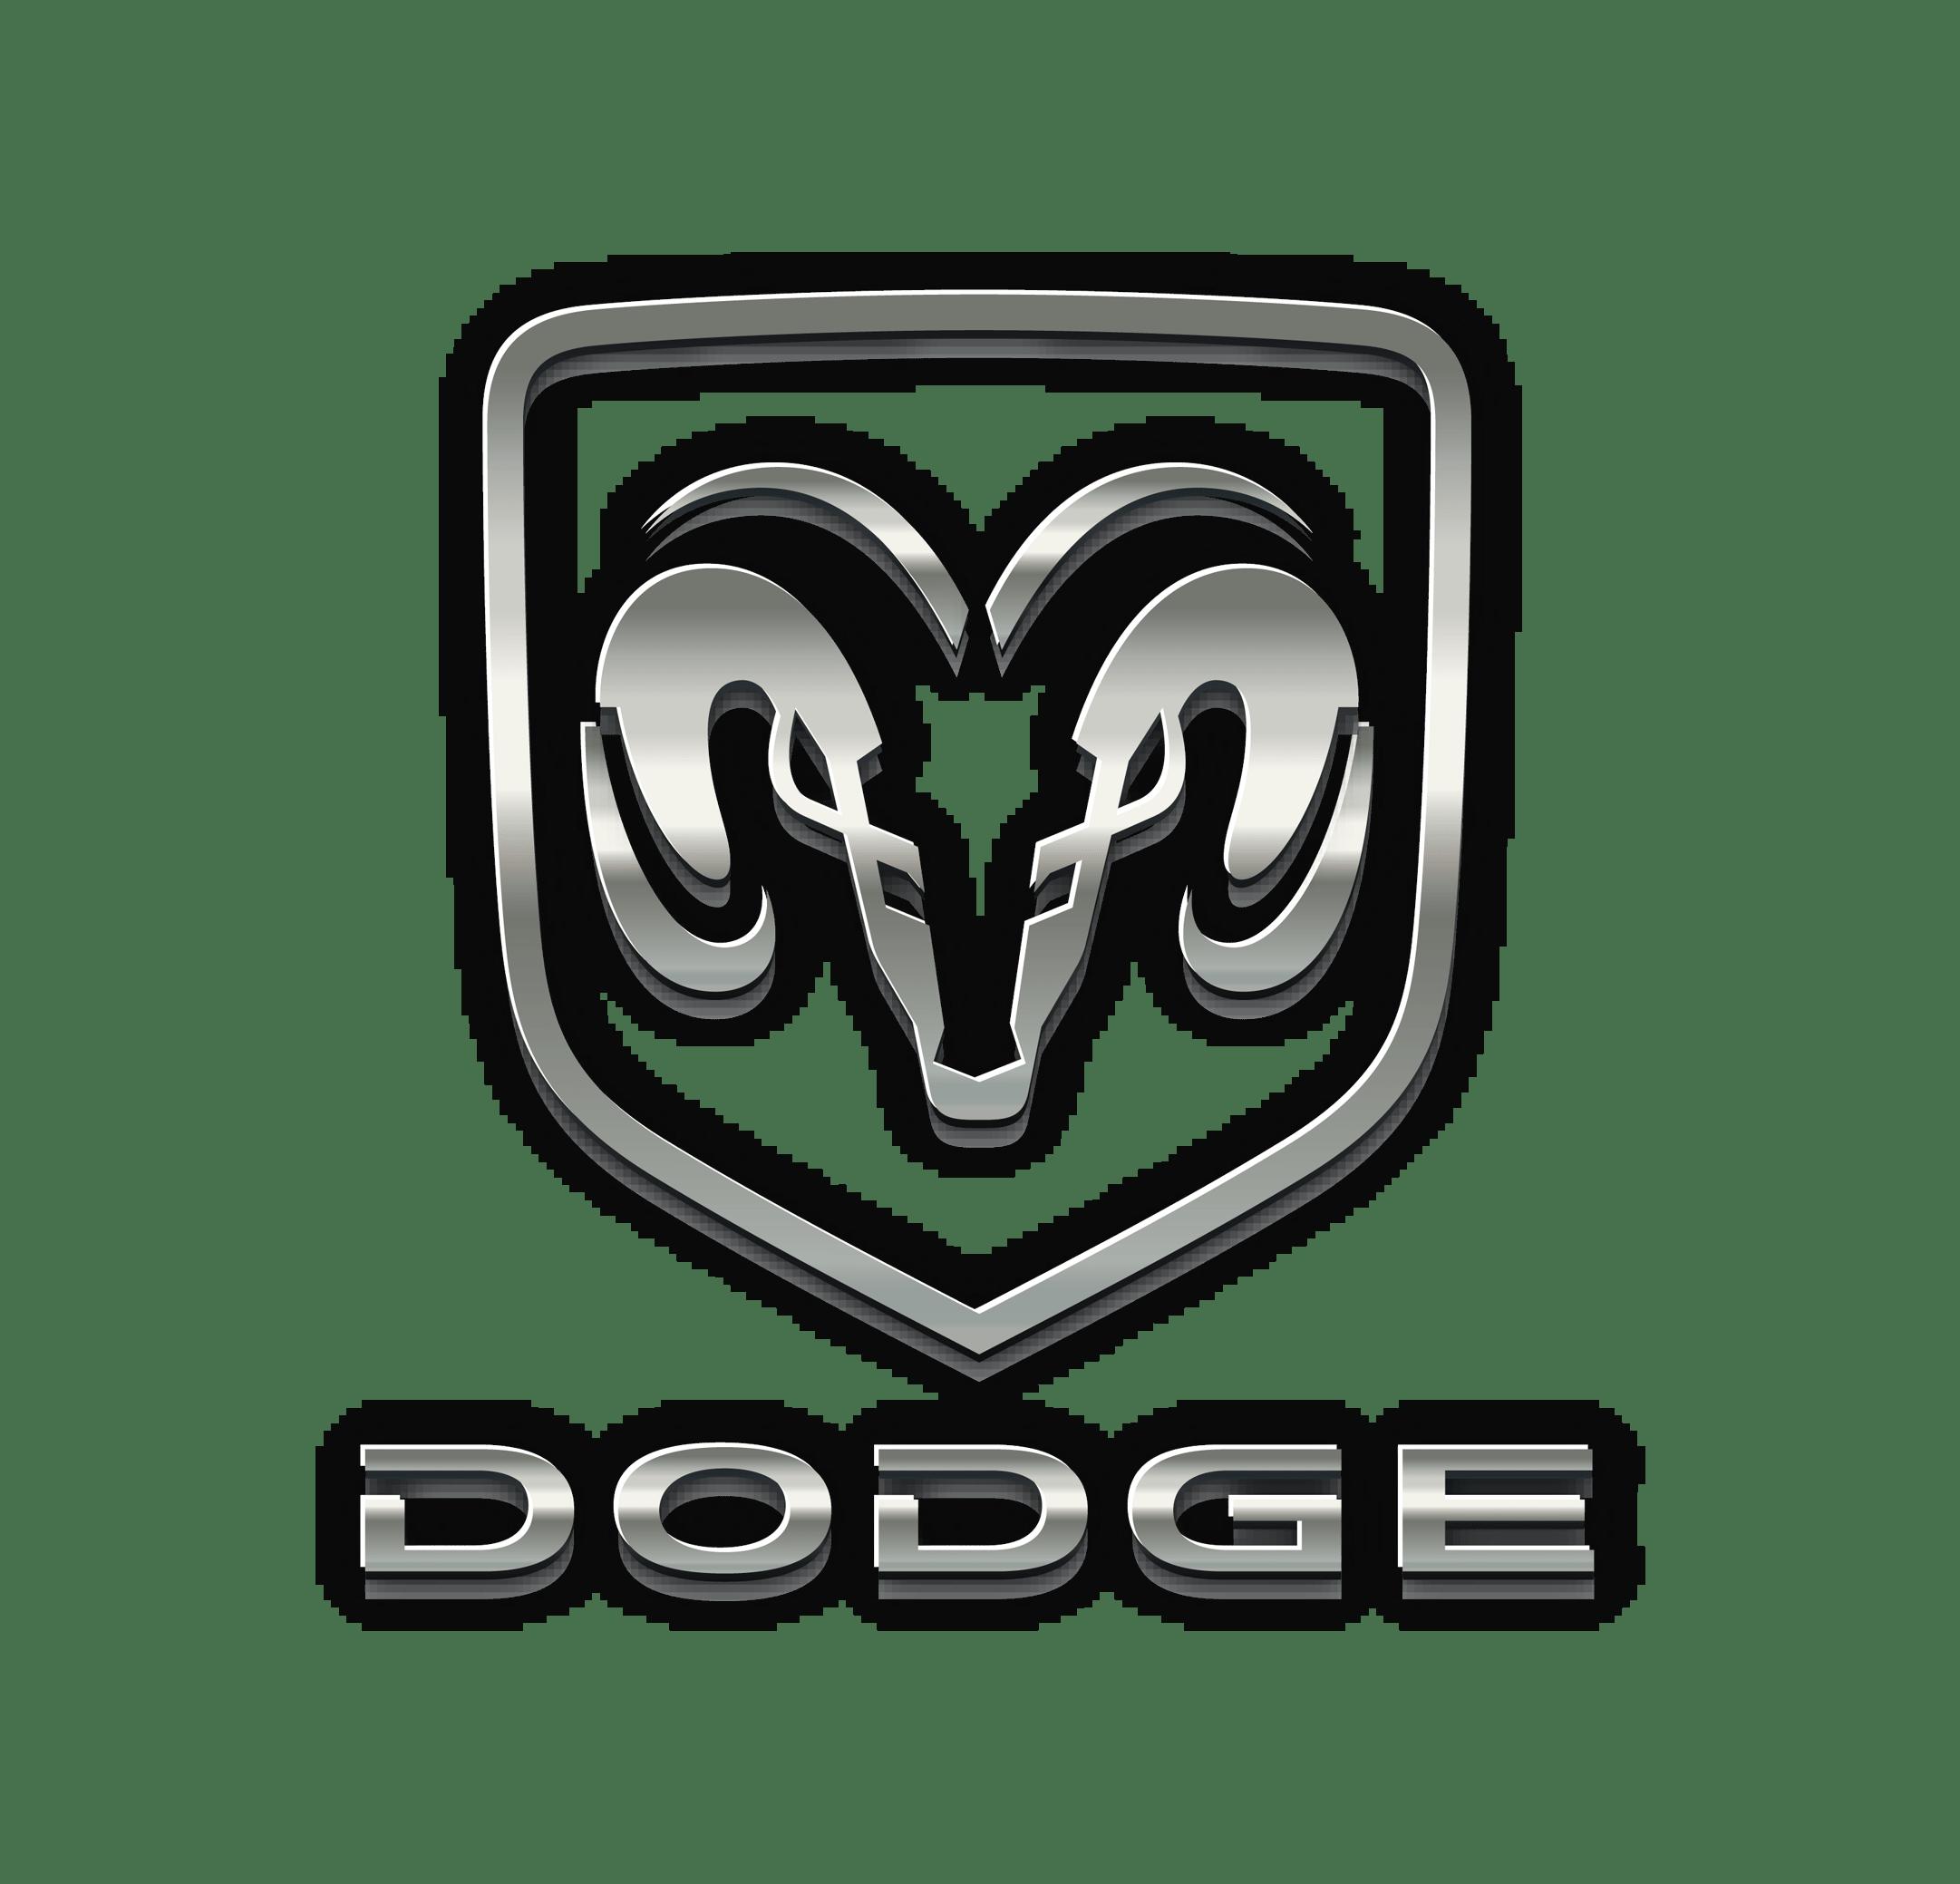 DODGE-min.png